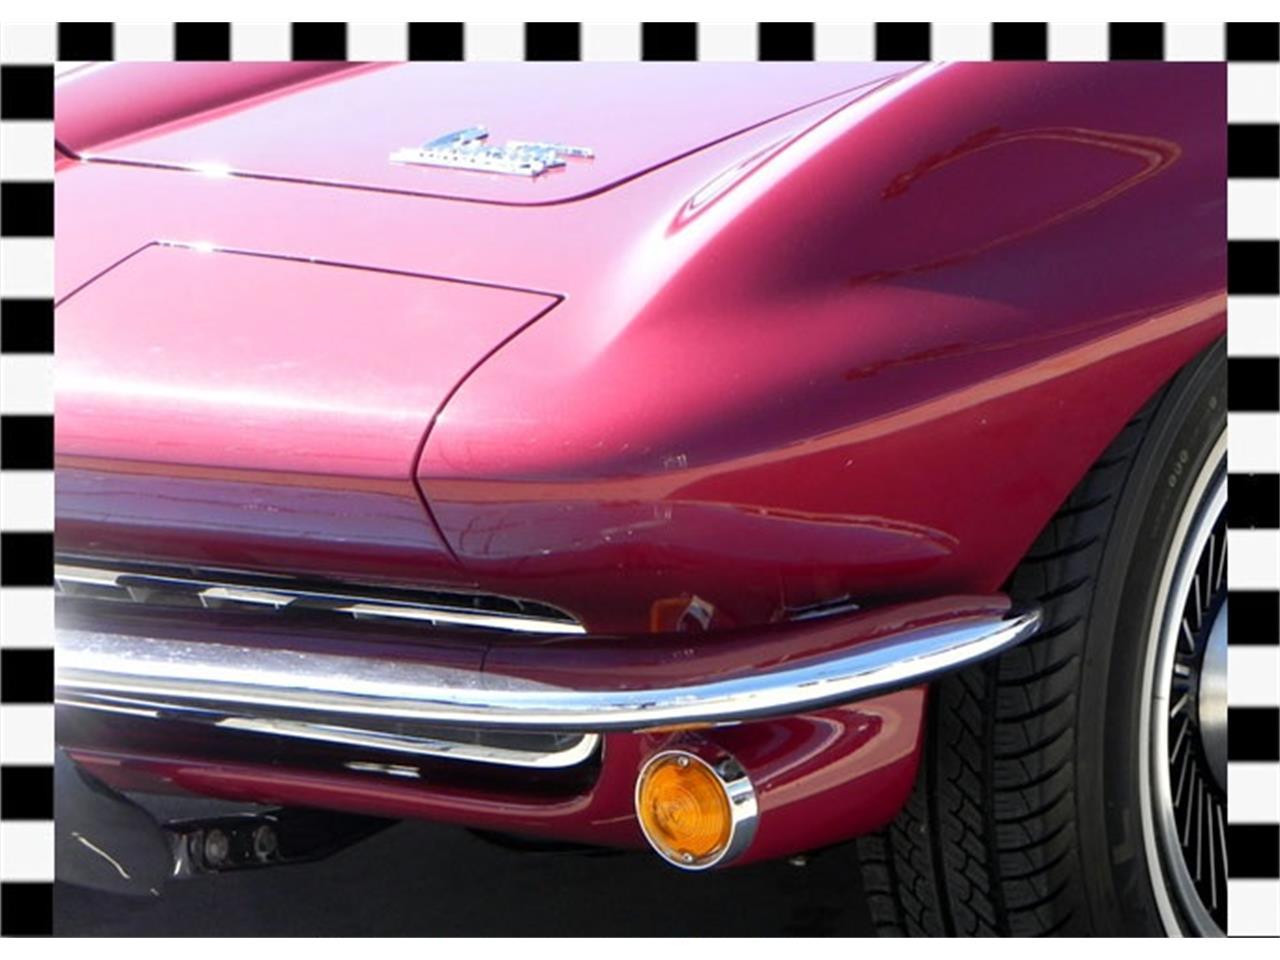 Large Picture of Classic '66 Chevrolet Corvette - $99,900.00 - FLDD